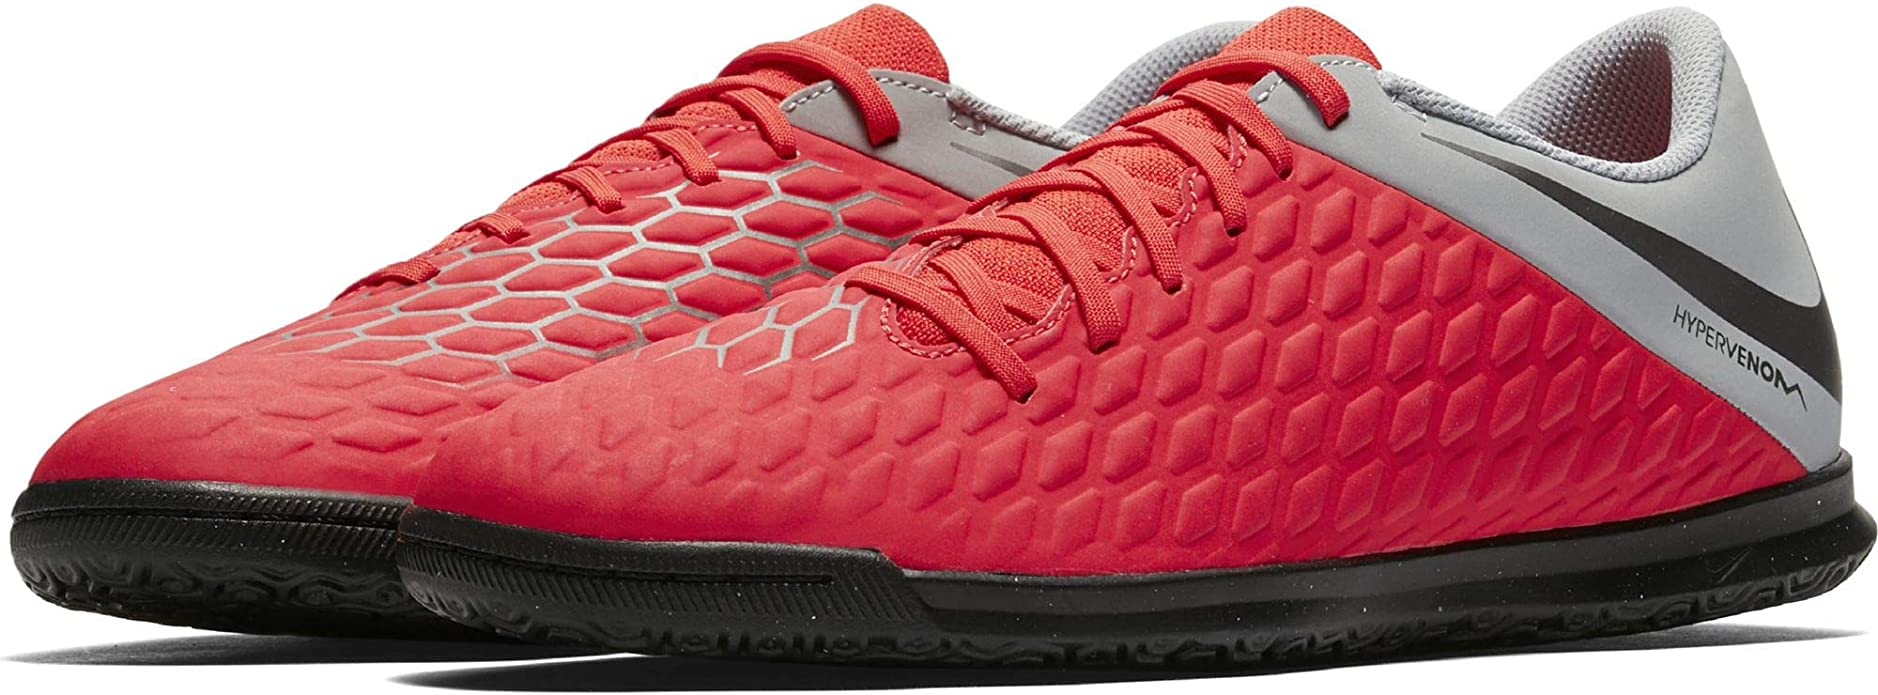 Rebajar Pekkadillo Desmañado  Nike Hypervenom 3 Club IC, Chaussures de Futsal Mixte Adulte, Multicolore  (Lt Crimson/MTLC Dark Grey/Wolf Grey 600), 38.5 EU: Amazon.fr: Chaussures  et Sacs